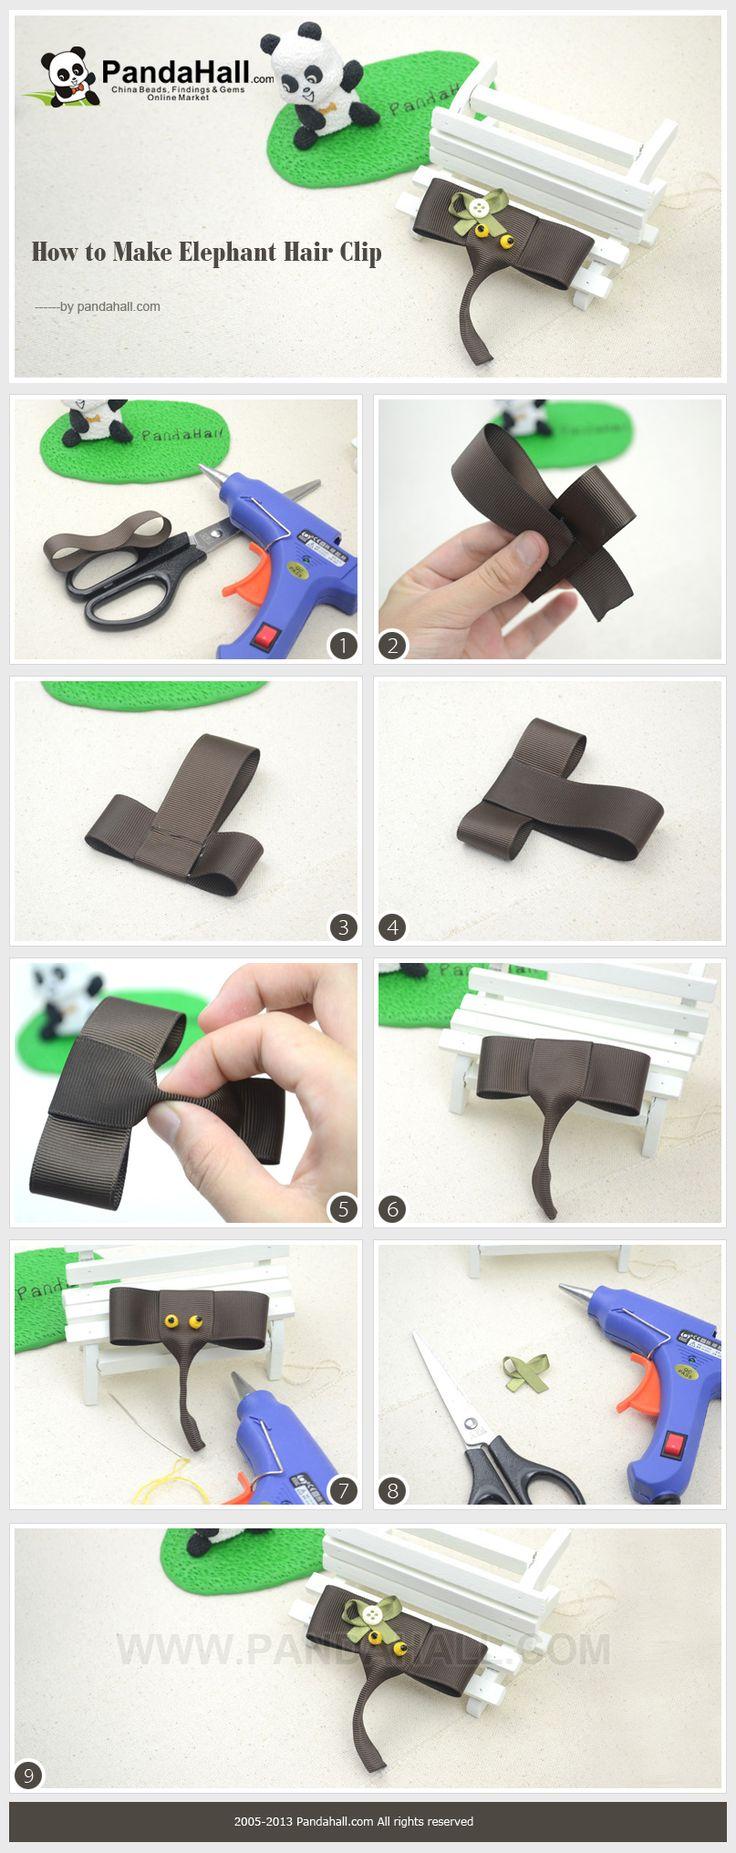 How to Make Elephant Hair Clip